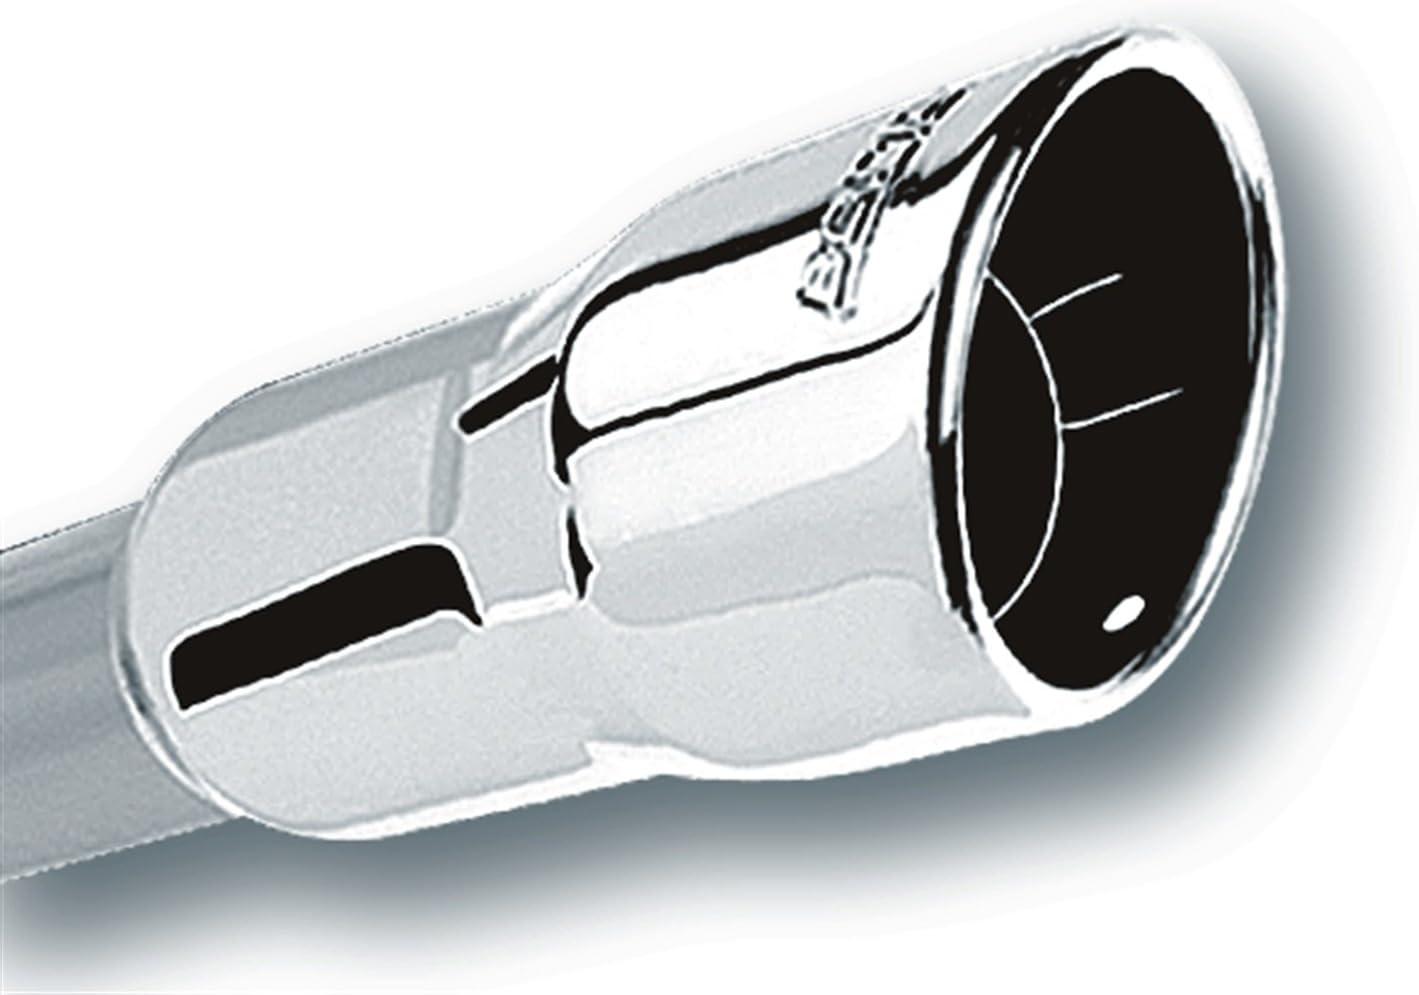 Borla 20251 Exhaust Tip